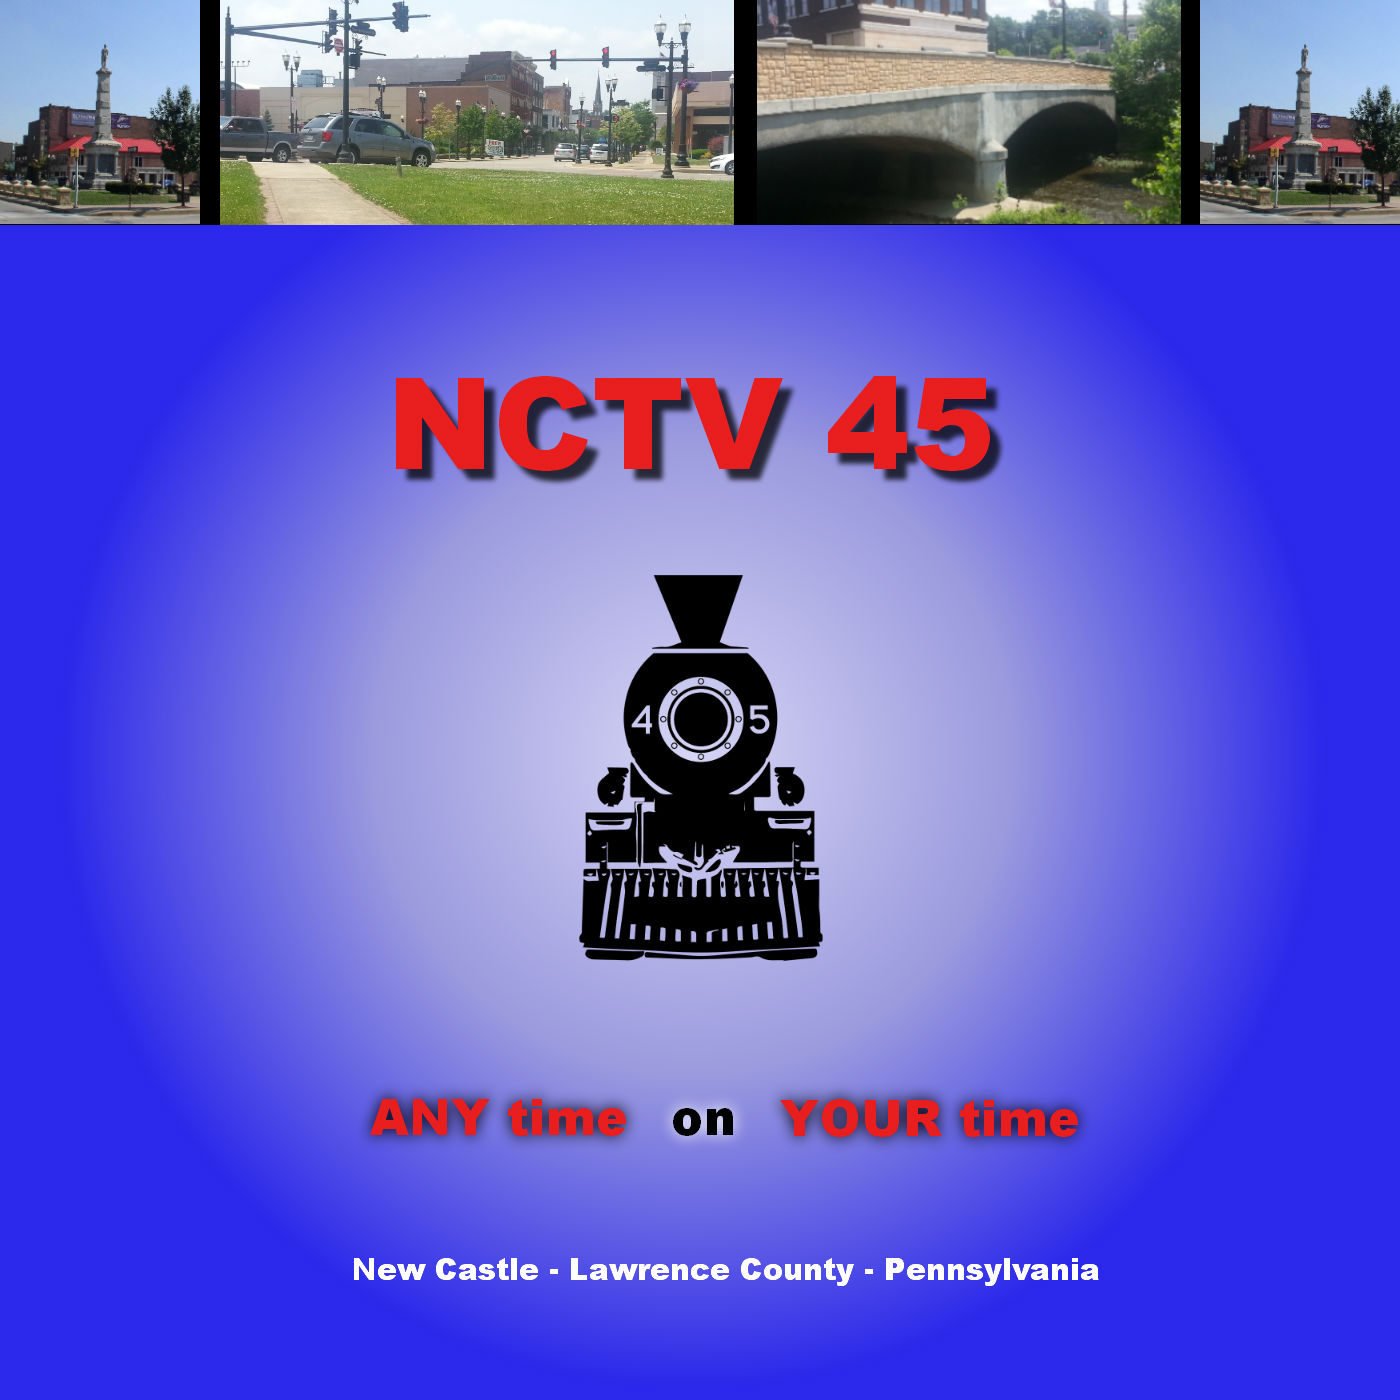 Artwork for NCTV45's Etiquette in a Minute Thursday July 11 2019